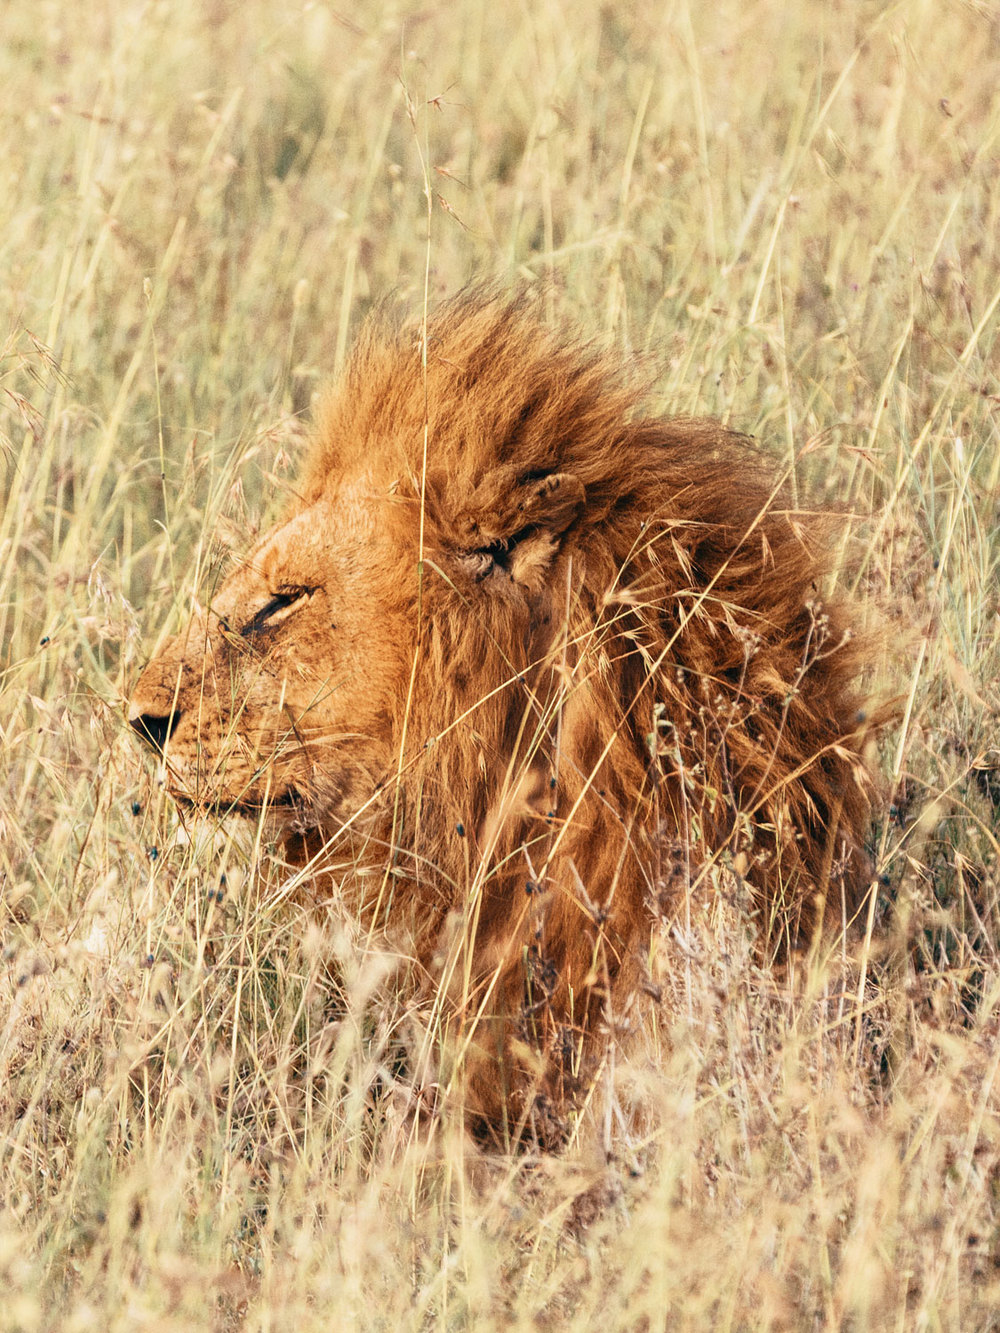 CallieGiovanna_Africa_Tanzania_Serengeti_20150101_07815.jpg